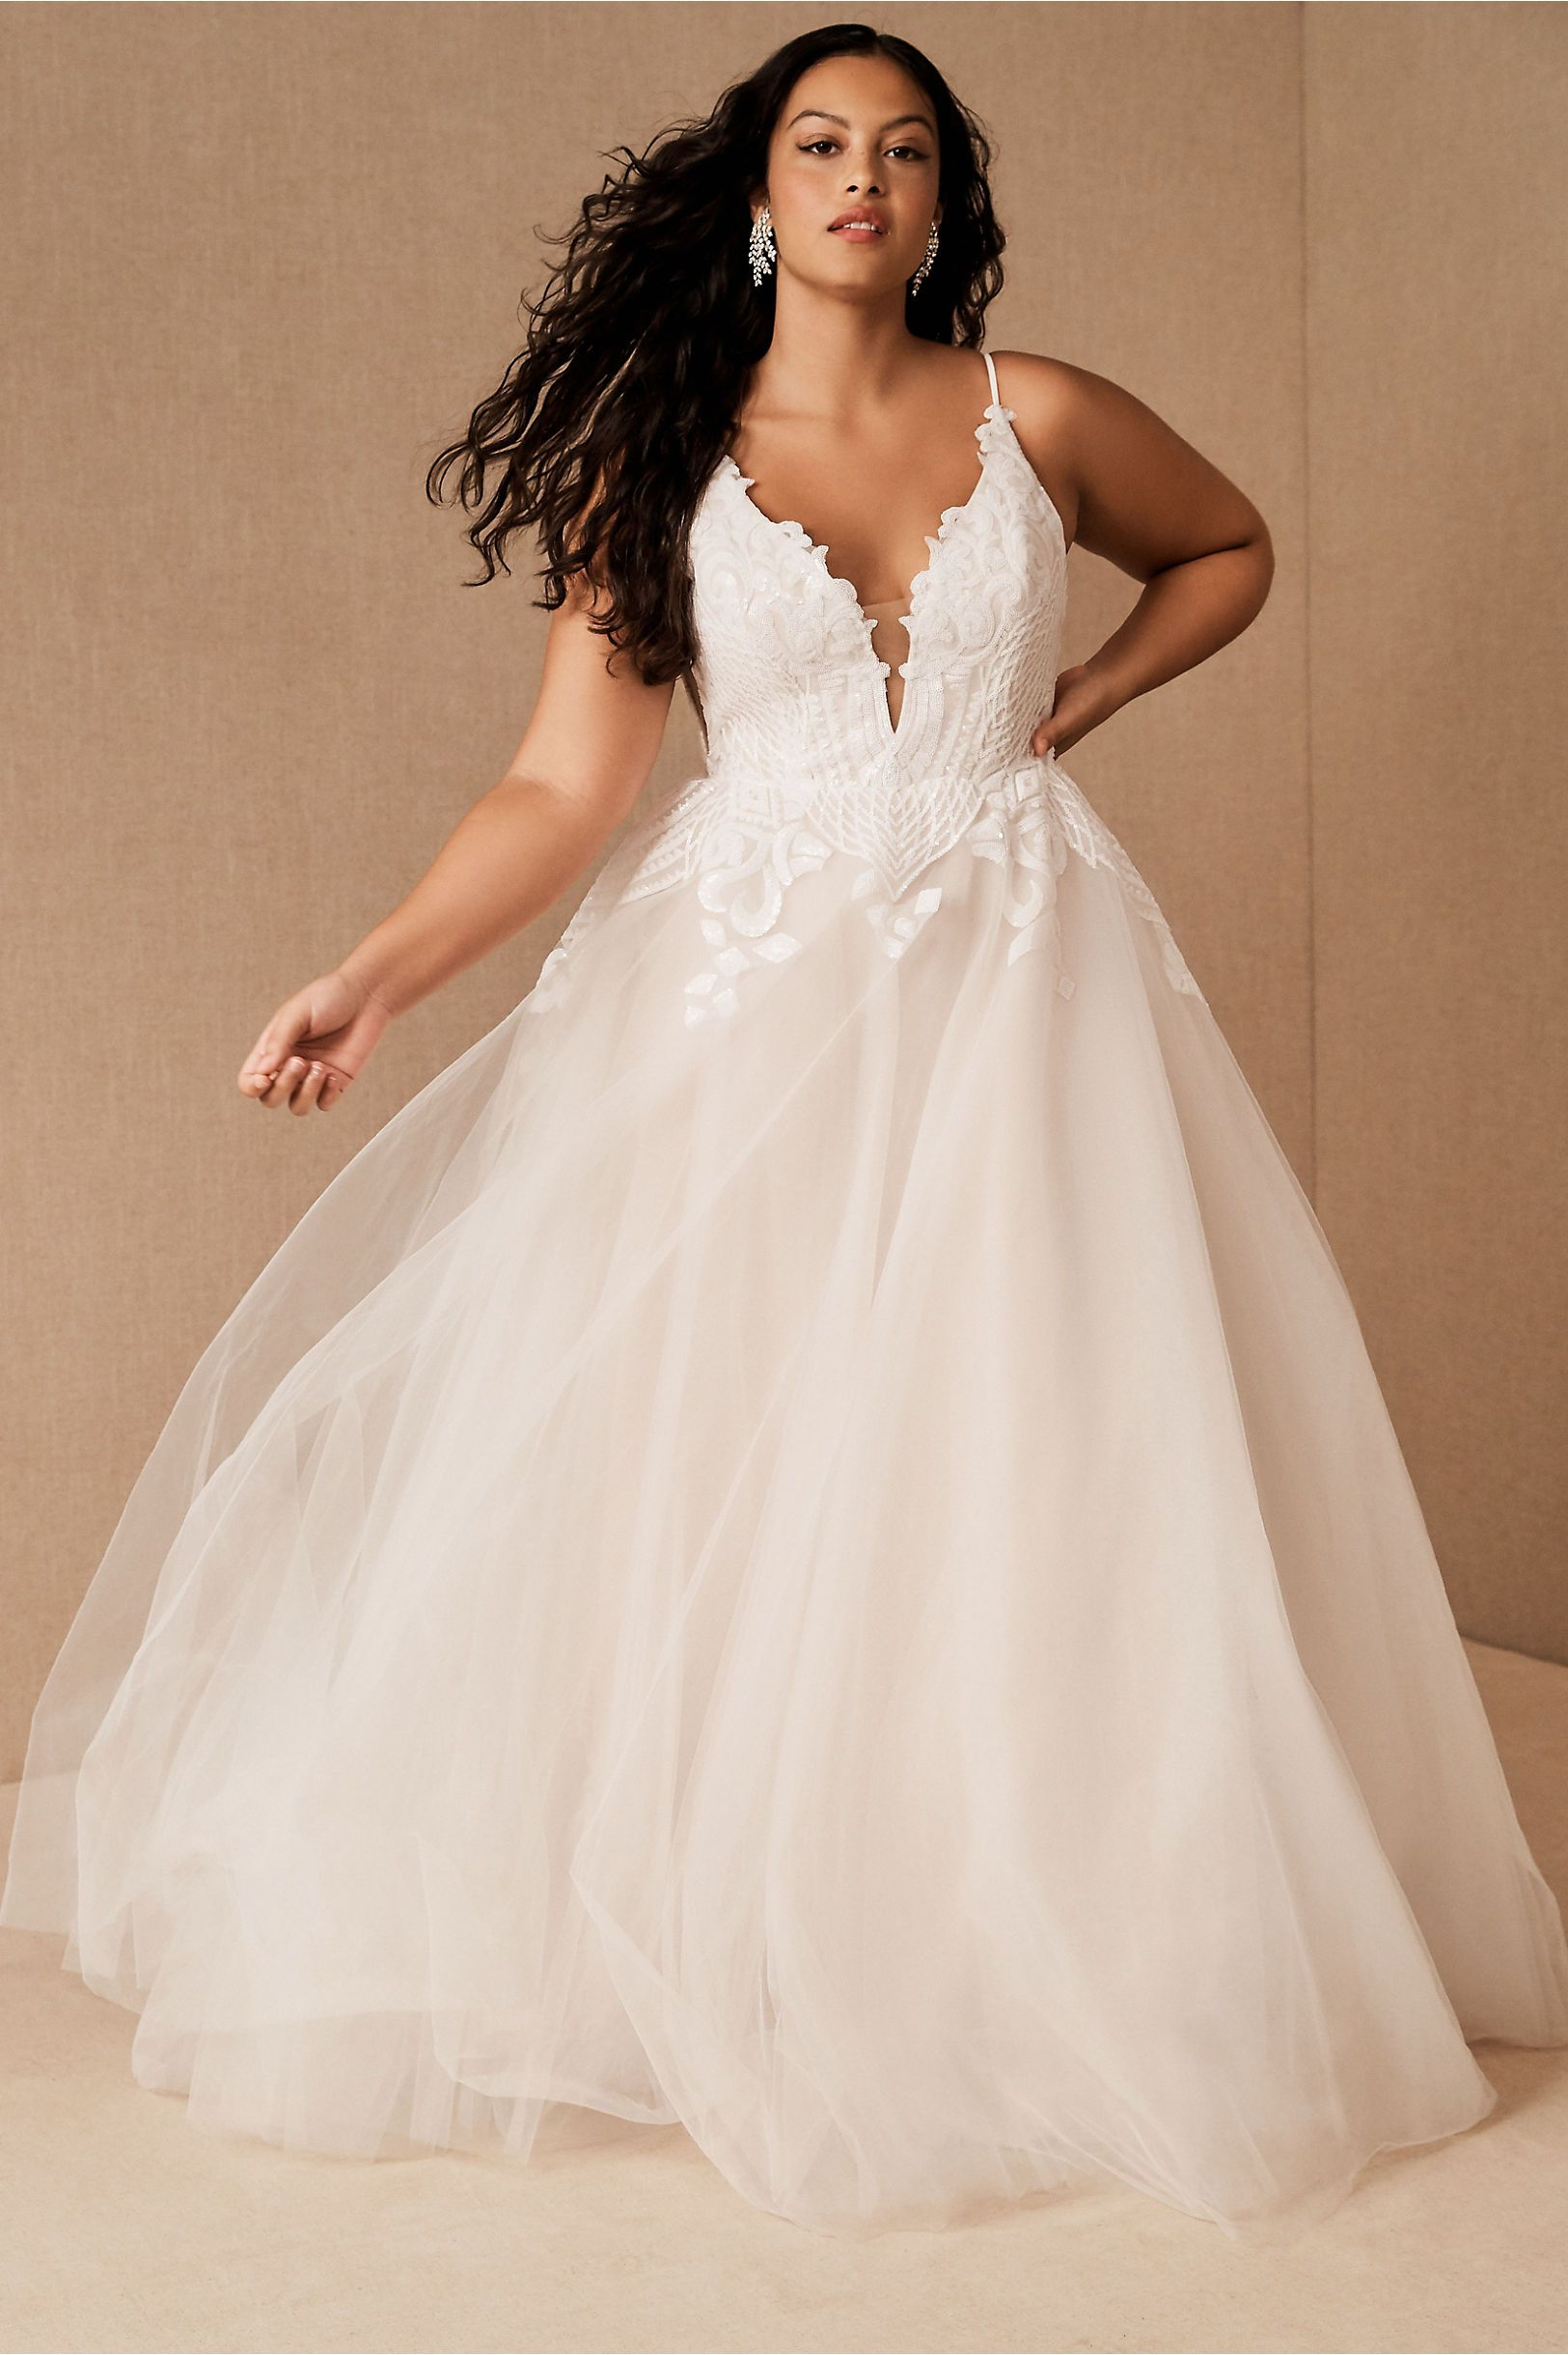 Bhldn S Hayley Paige Topanga Gown In Ivory Online Wedding Dress Plus Size Wedding Gowns Wedding Dresses Plus Size [ 2440 x 1625 Pixel ]